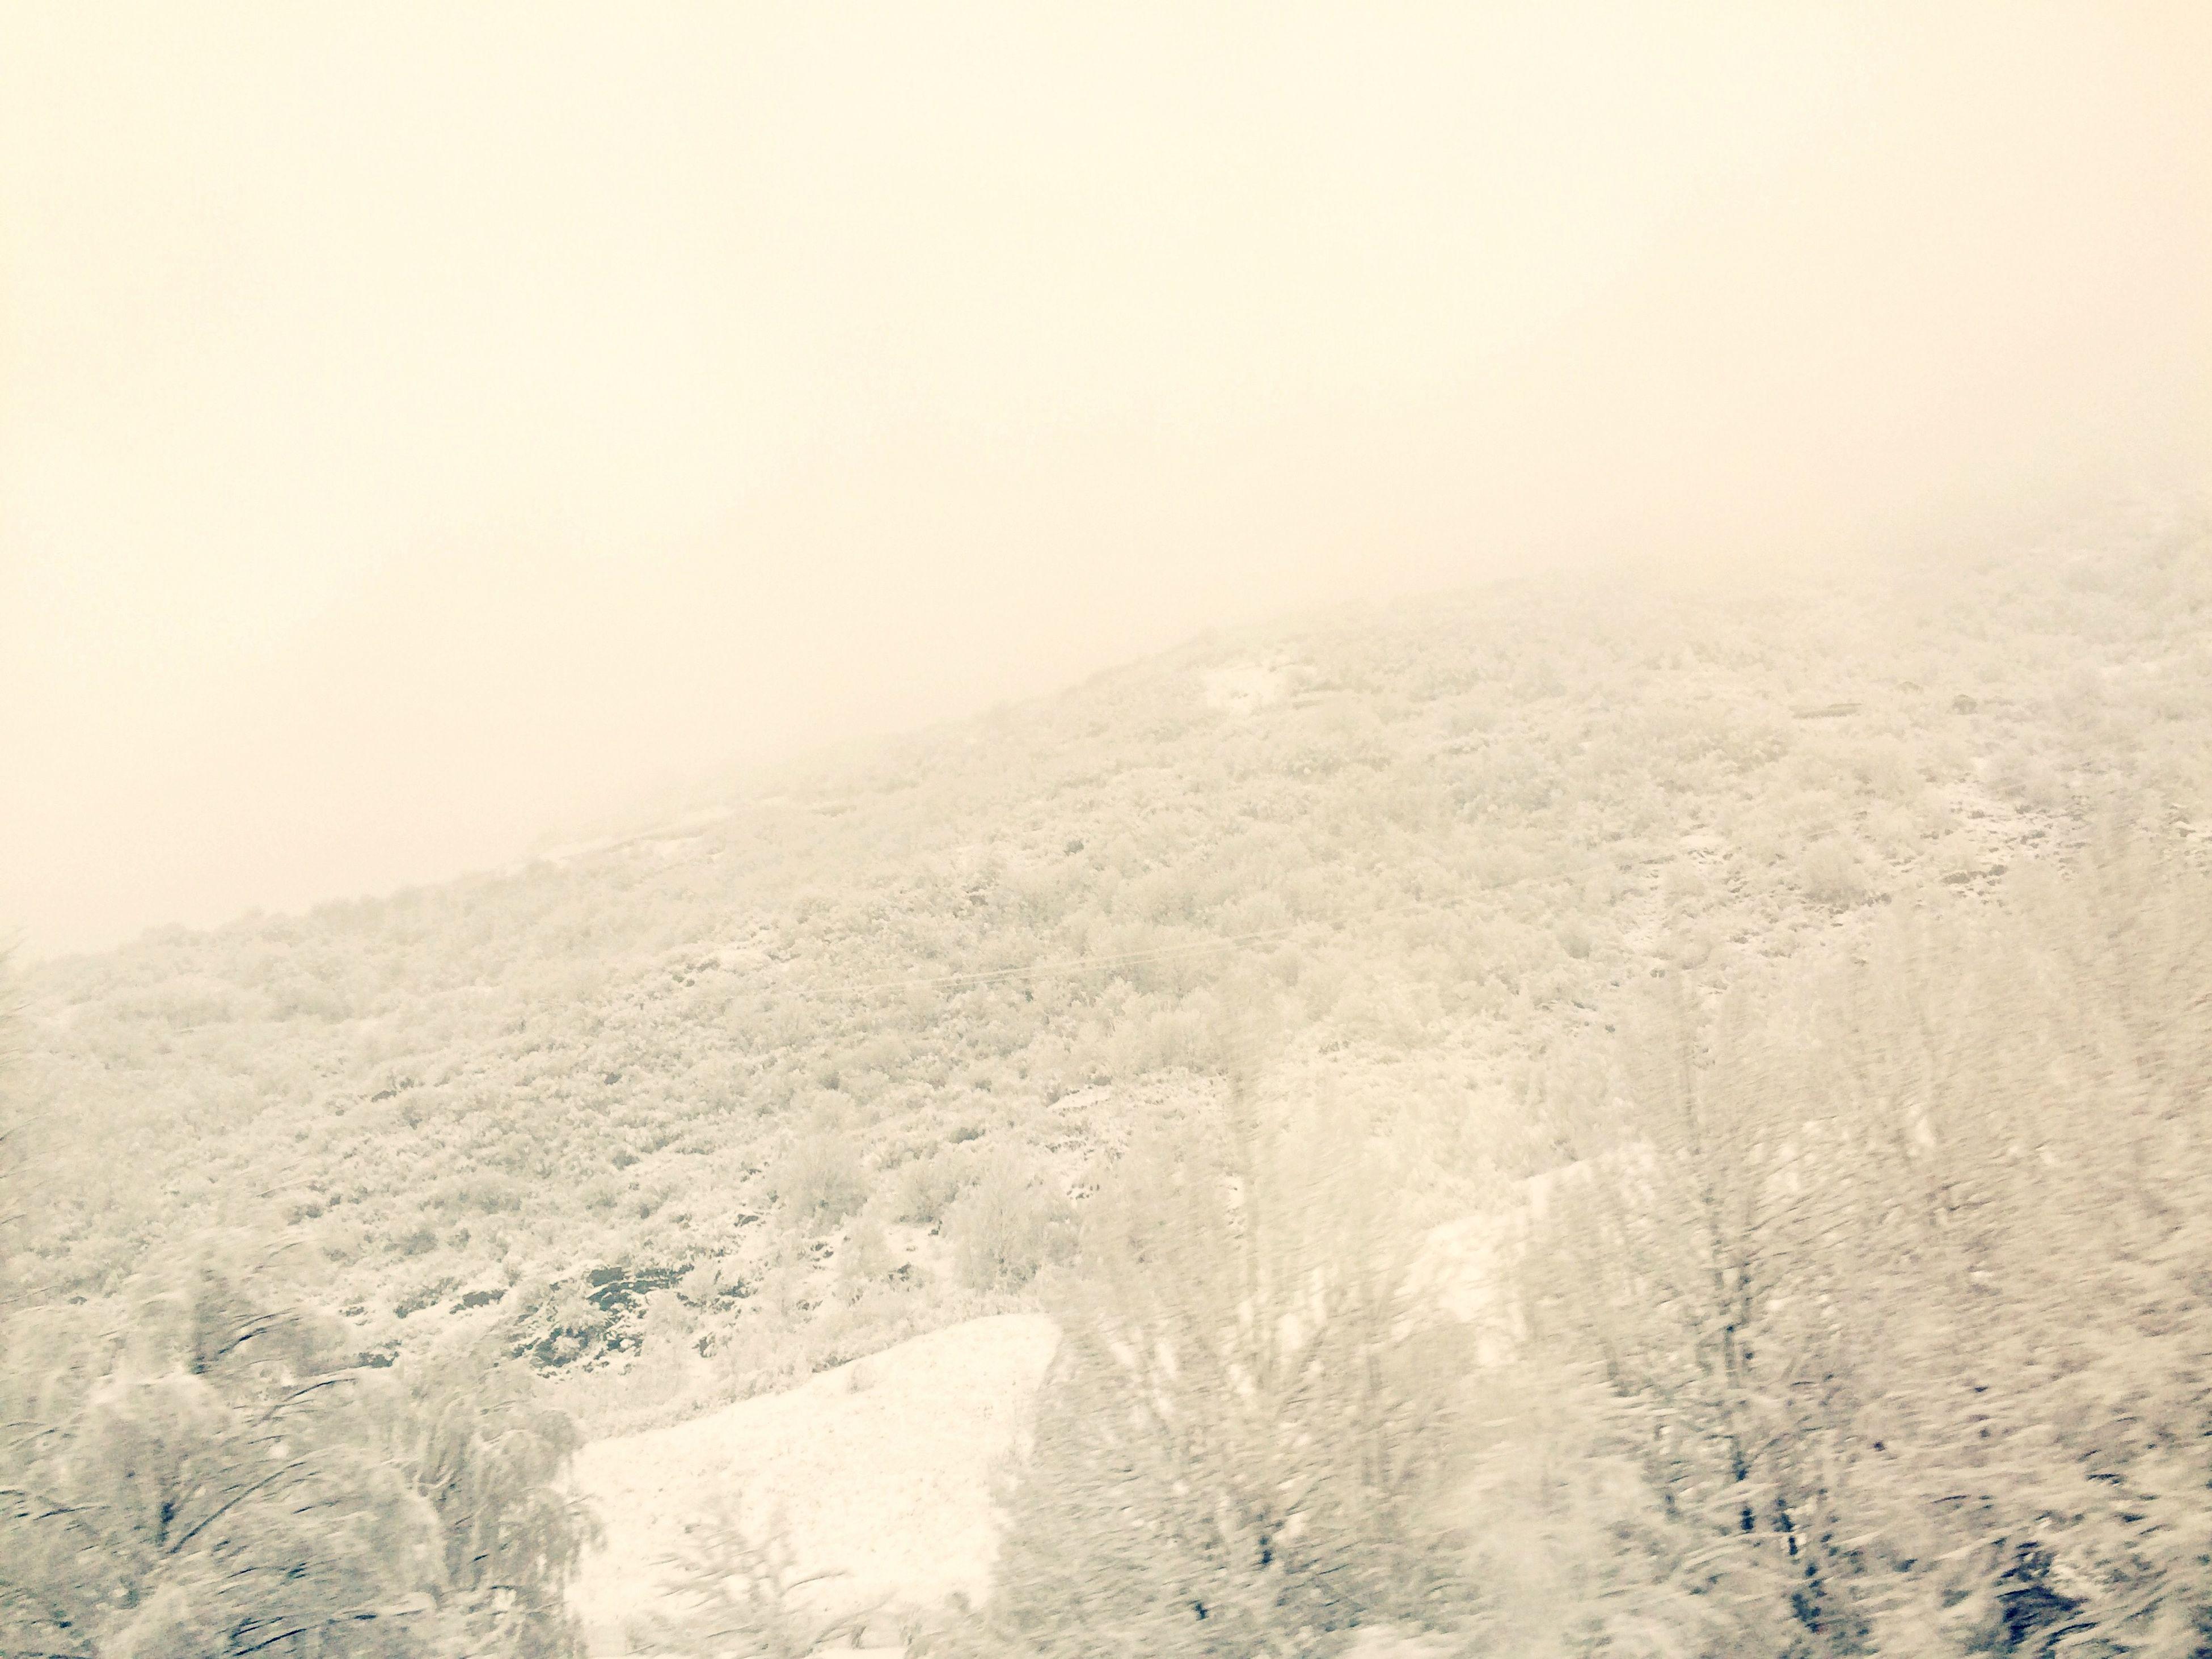 snow, winter, cold temperature, tranquil scene, tranquility, weather, landscape, fog, scenics, mountain, beauty in nature, copy space, nature, non-urban scene, foggy, season, covering, remote, idyllic